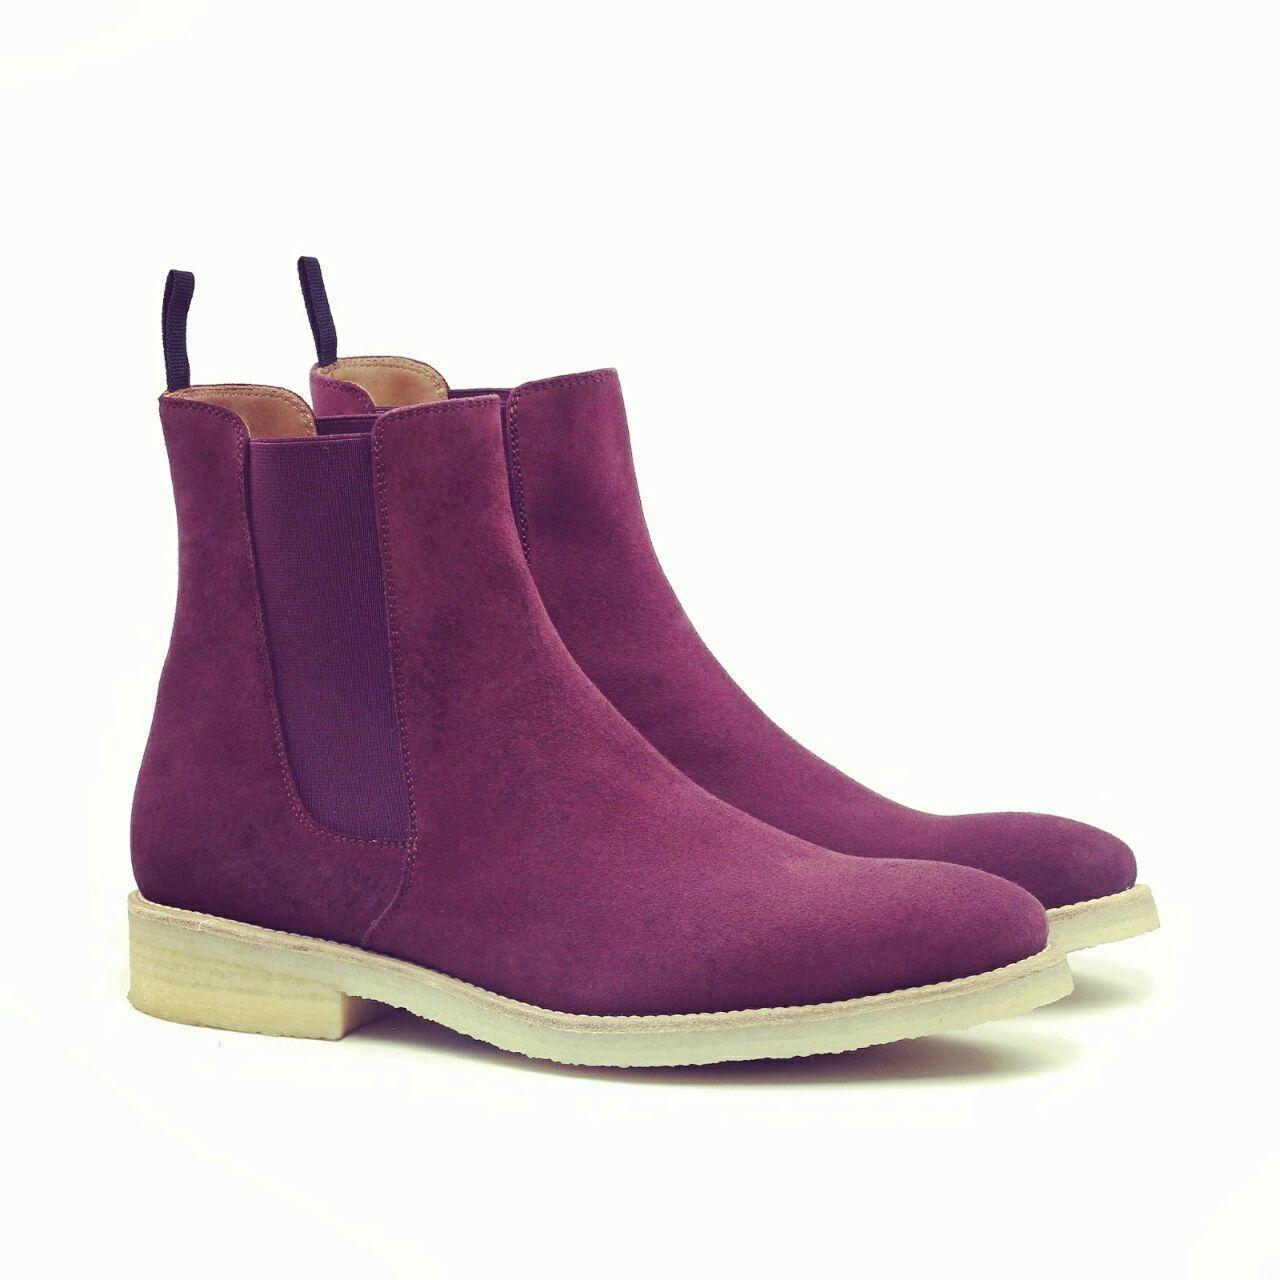 hombres Fatto A Mano Pelle zapatos púrpura Alto Caviglia Pulsante botas IT